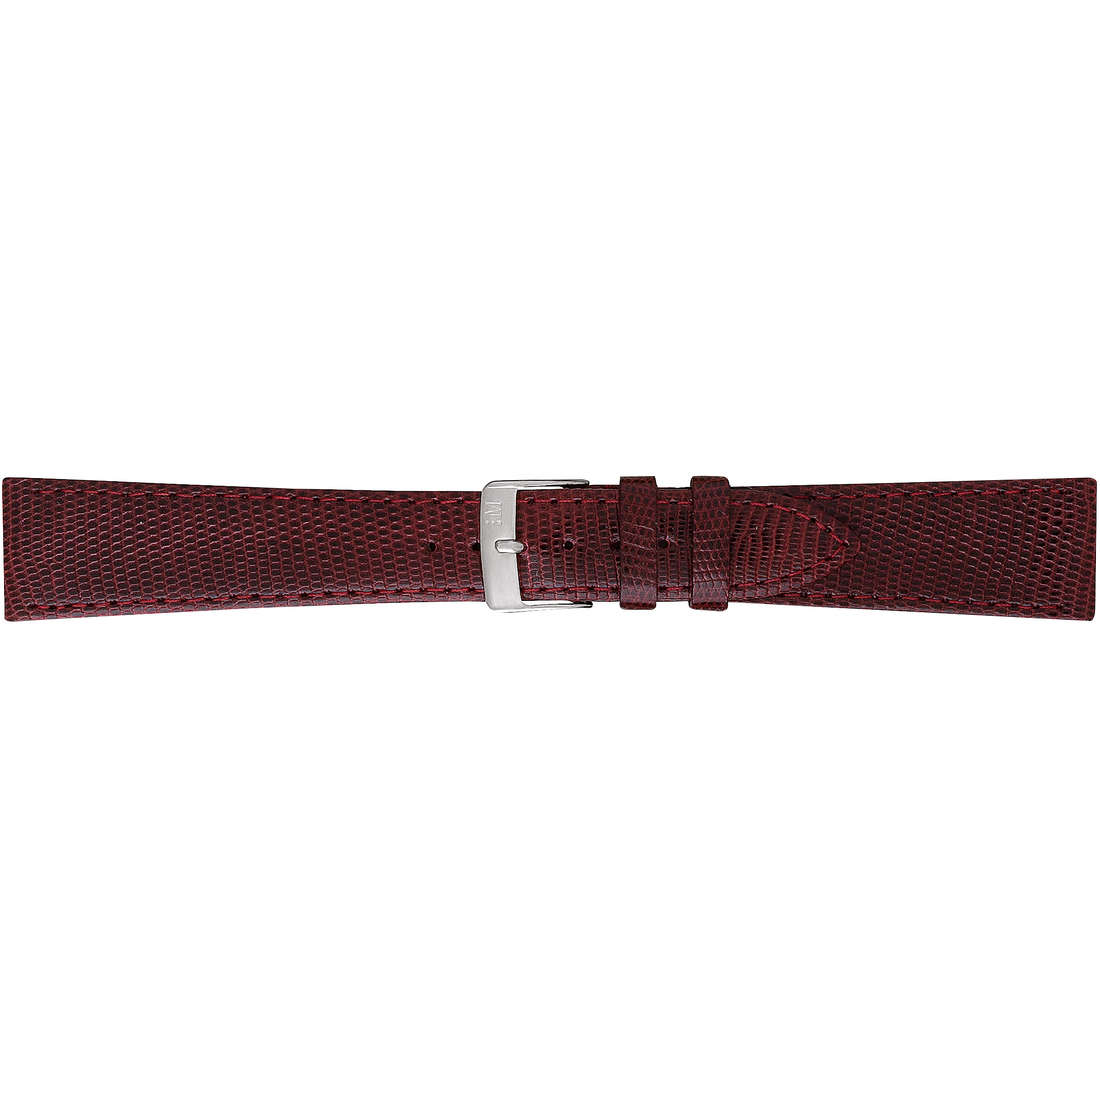 watch watch bands watch straps man Morellato Pelli Preziose A01U0858040082CR16